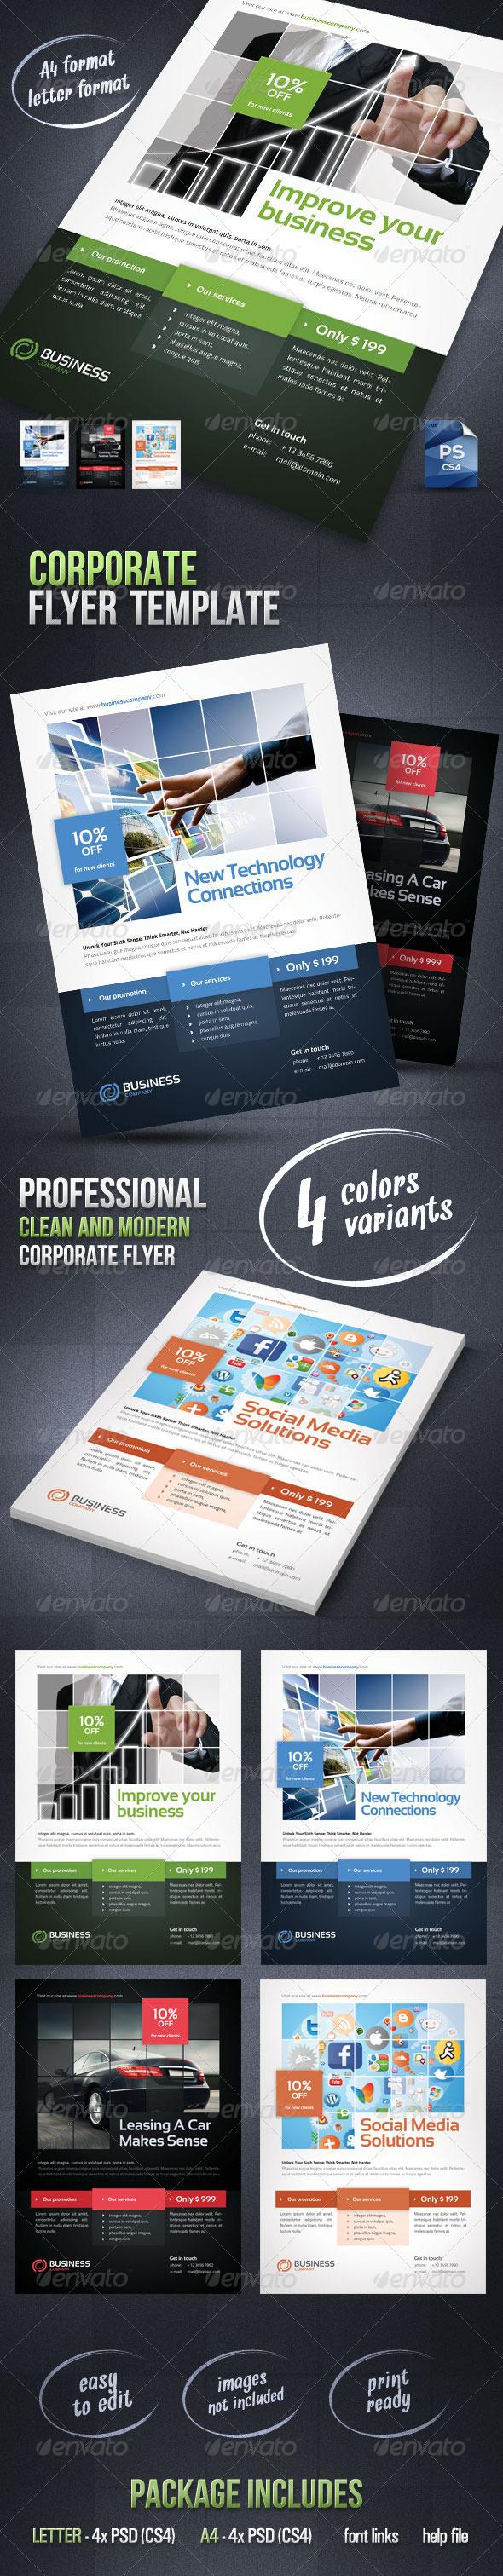 GraphicRiver Corporate Flyer Template 3075362